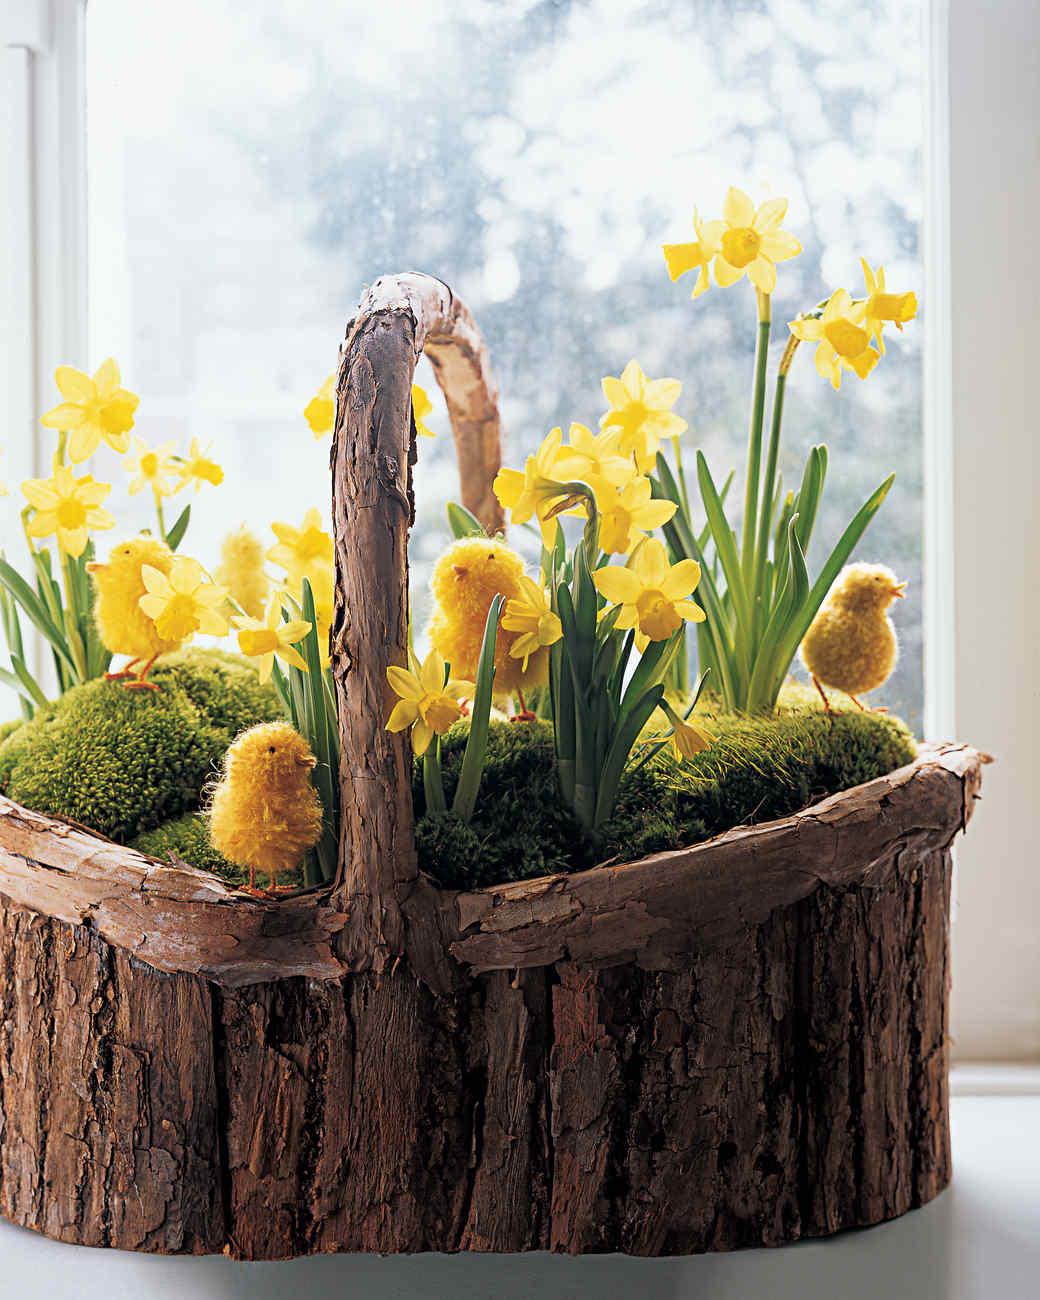 Basket of Bulbs